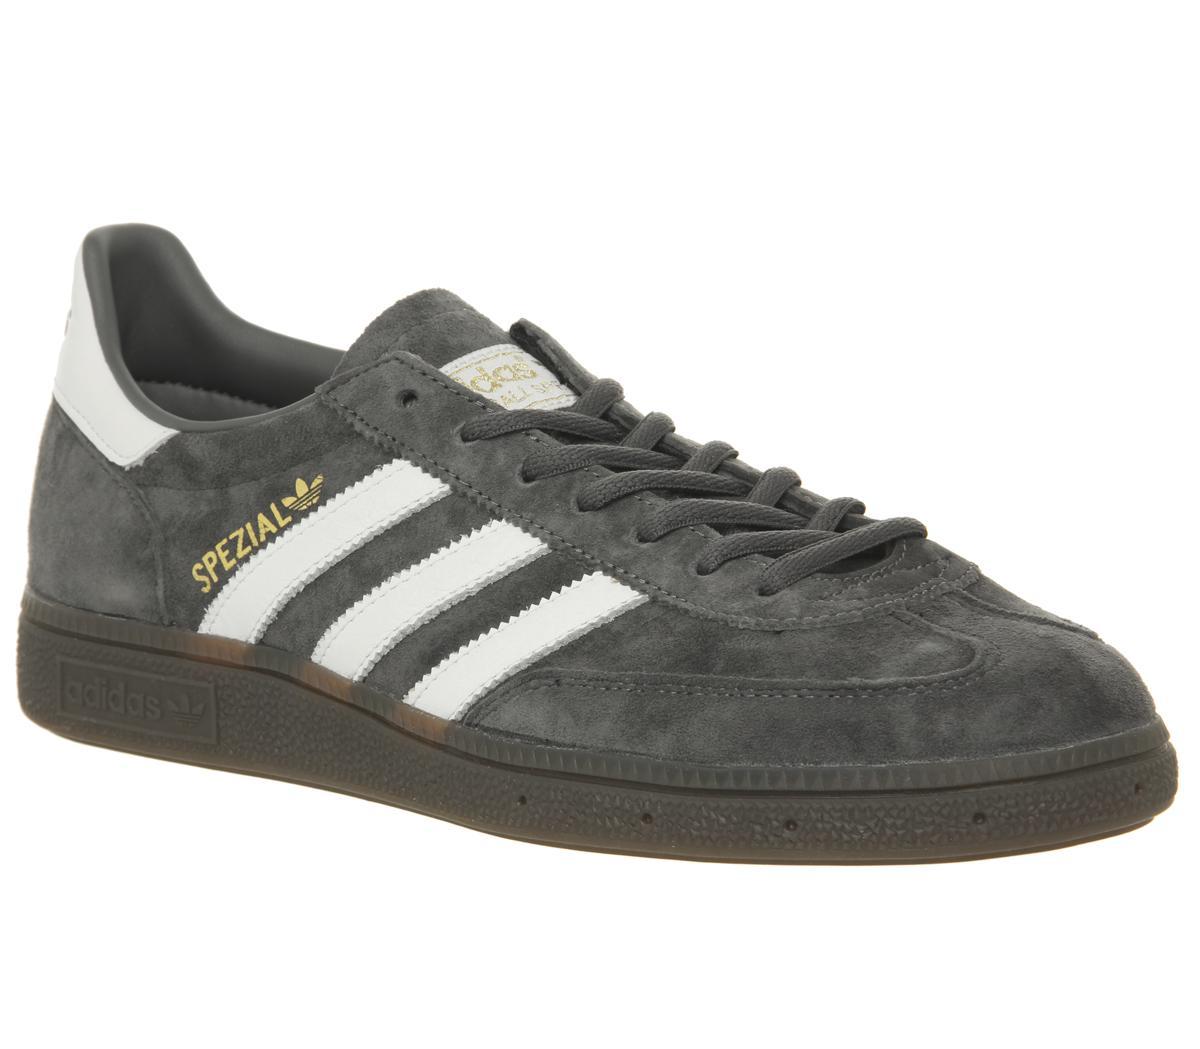 adidas spezial black grey Online